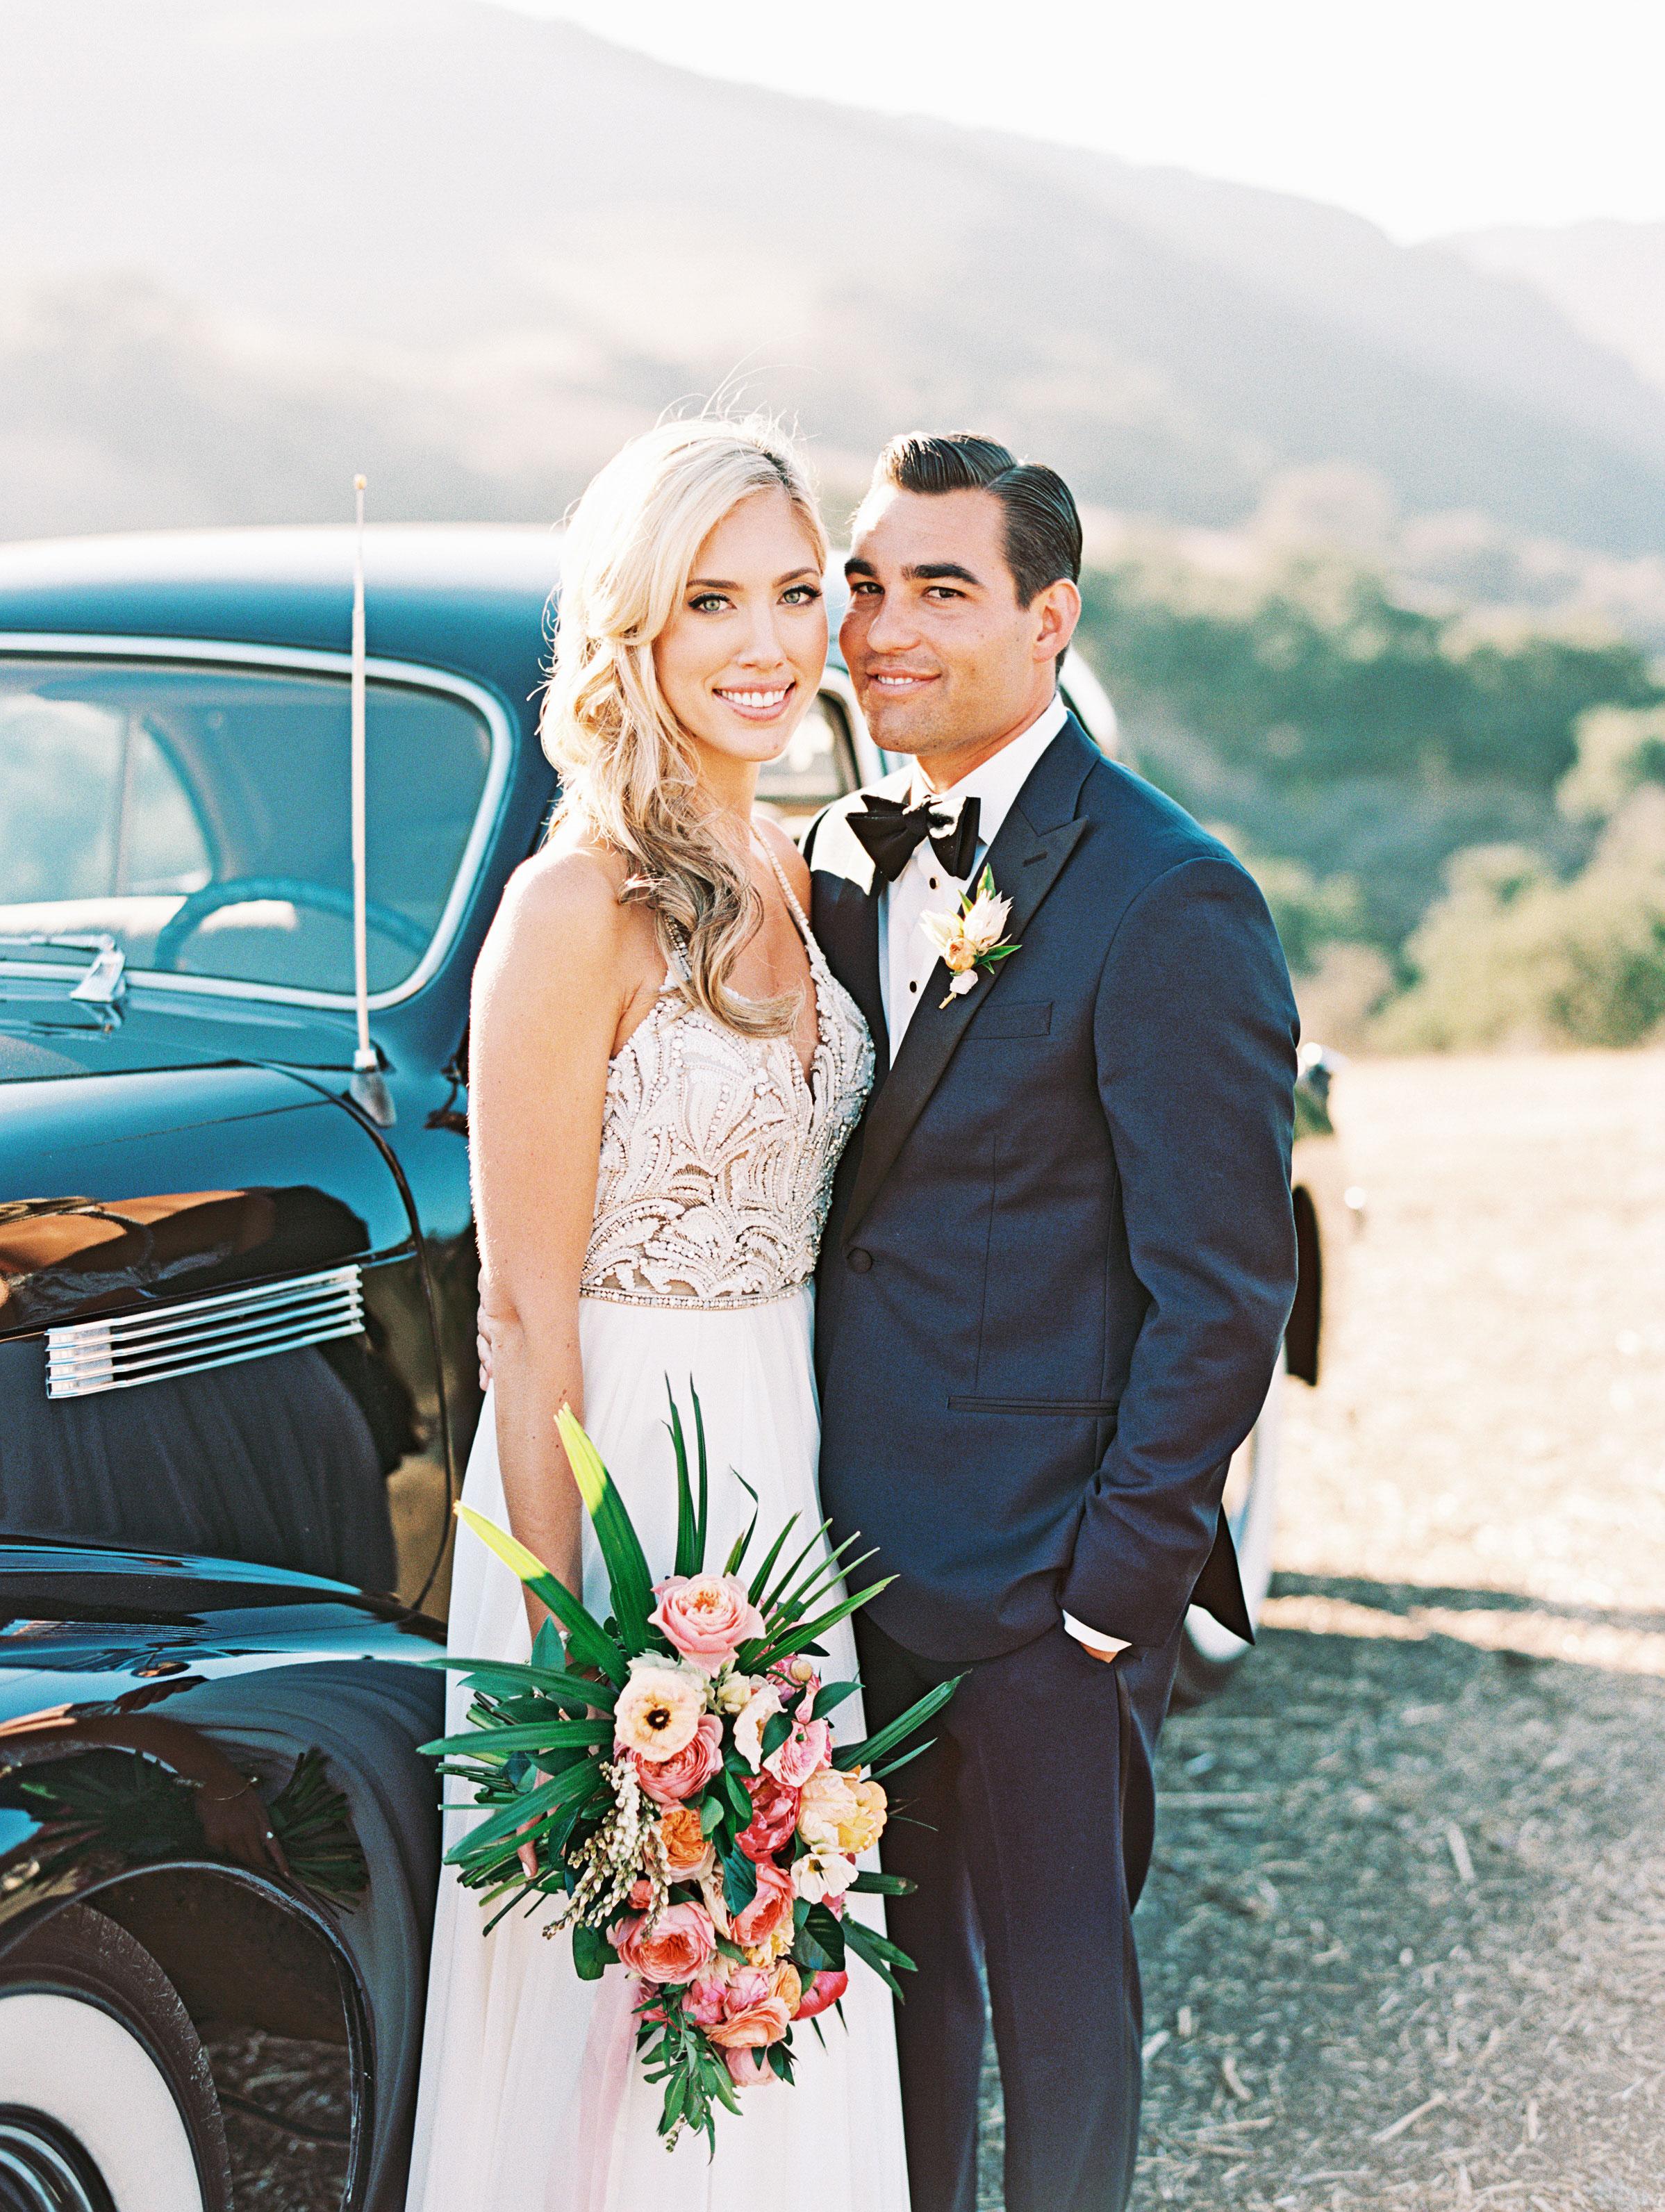 stephanie jared wedding couple by car